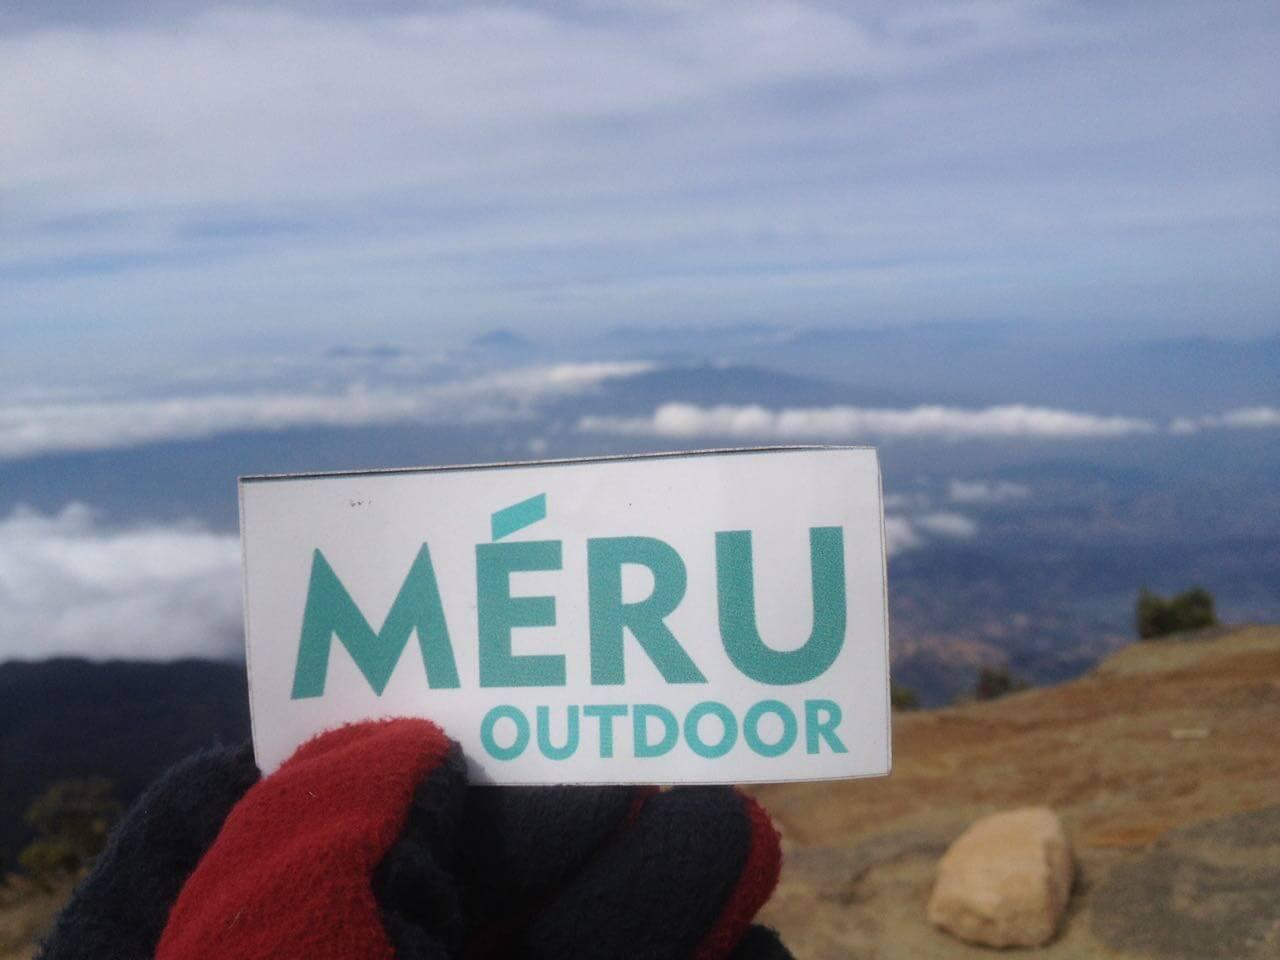 MERU Outdoor Cirebon di Puncak Gunung Ciremai 3078 mdpl (Foto oleh : @afvendiant)